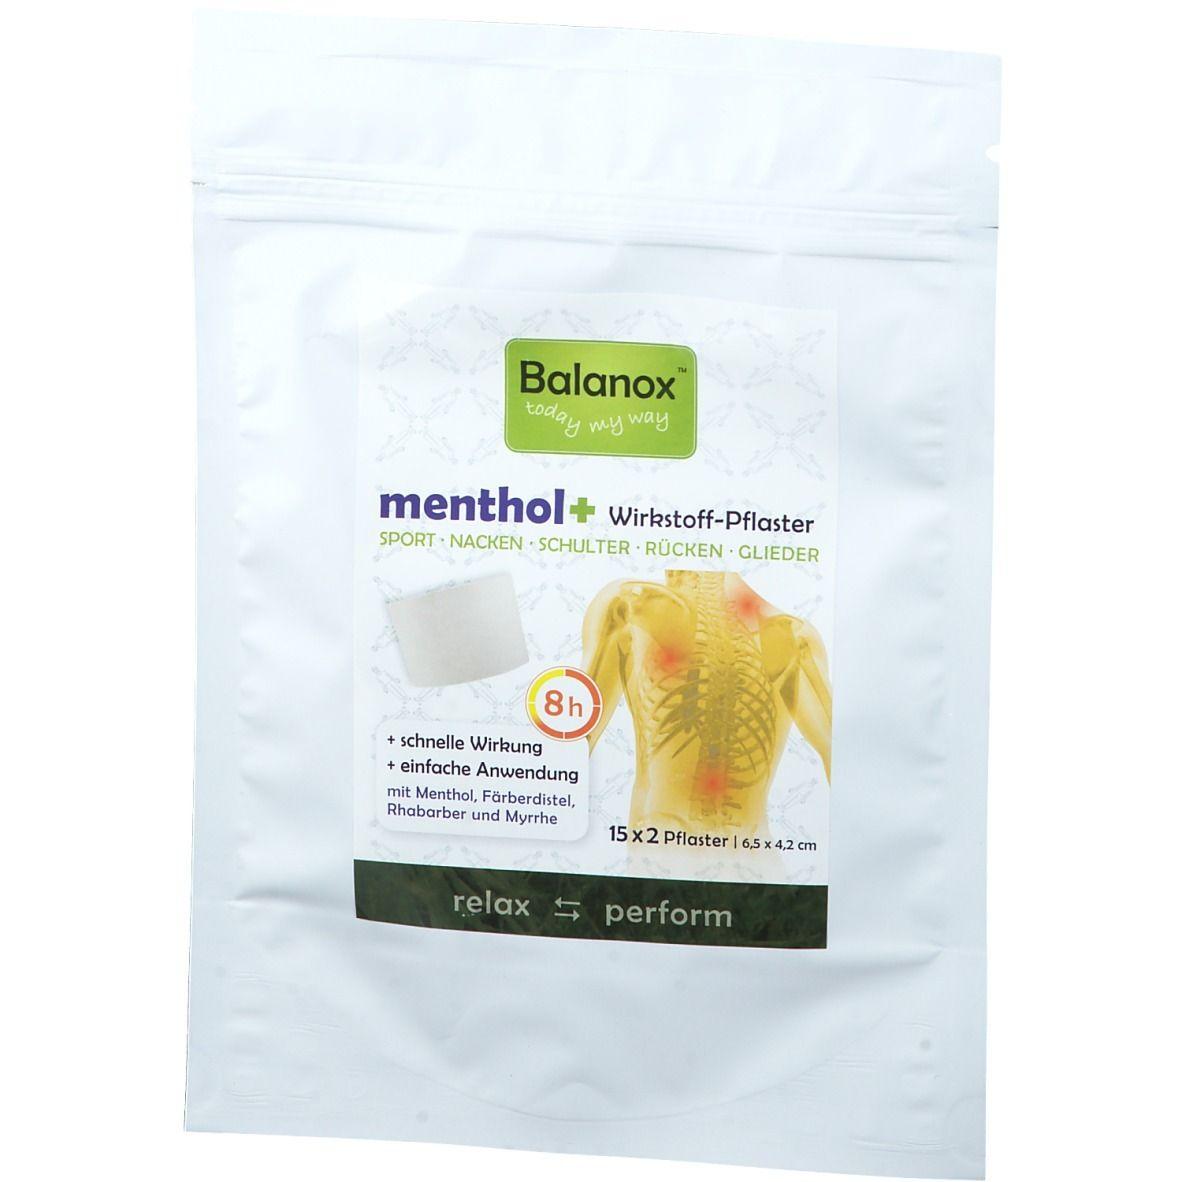 Image of Balanox™ menthol+ Wirktstoff-Pflaster